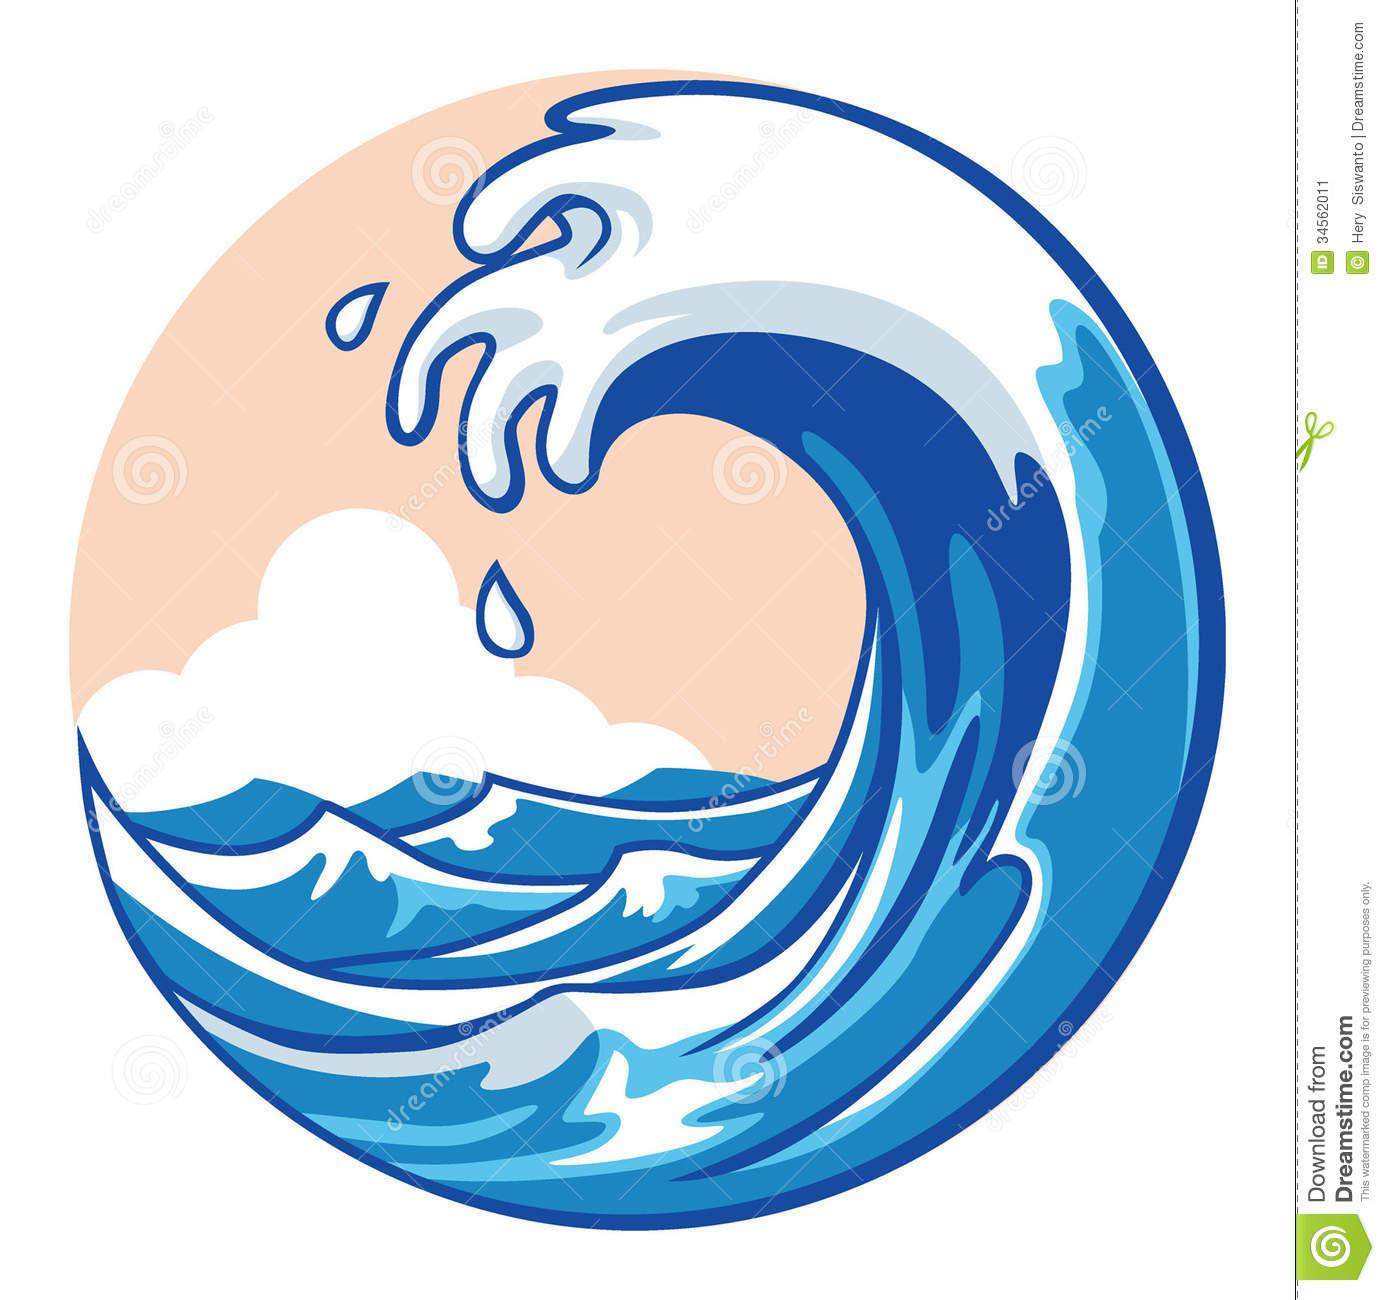 ocean clipartlook. Waves clipart wave hawaii